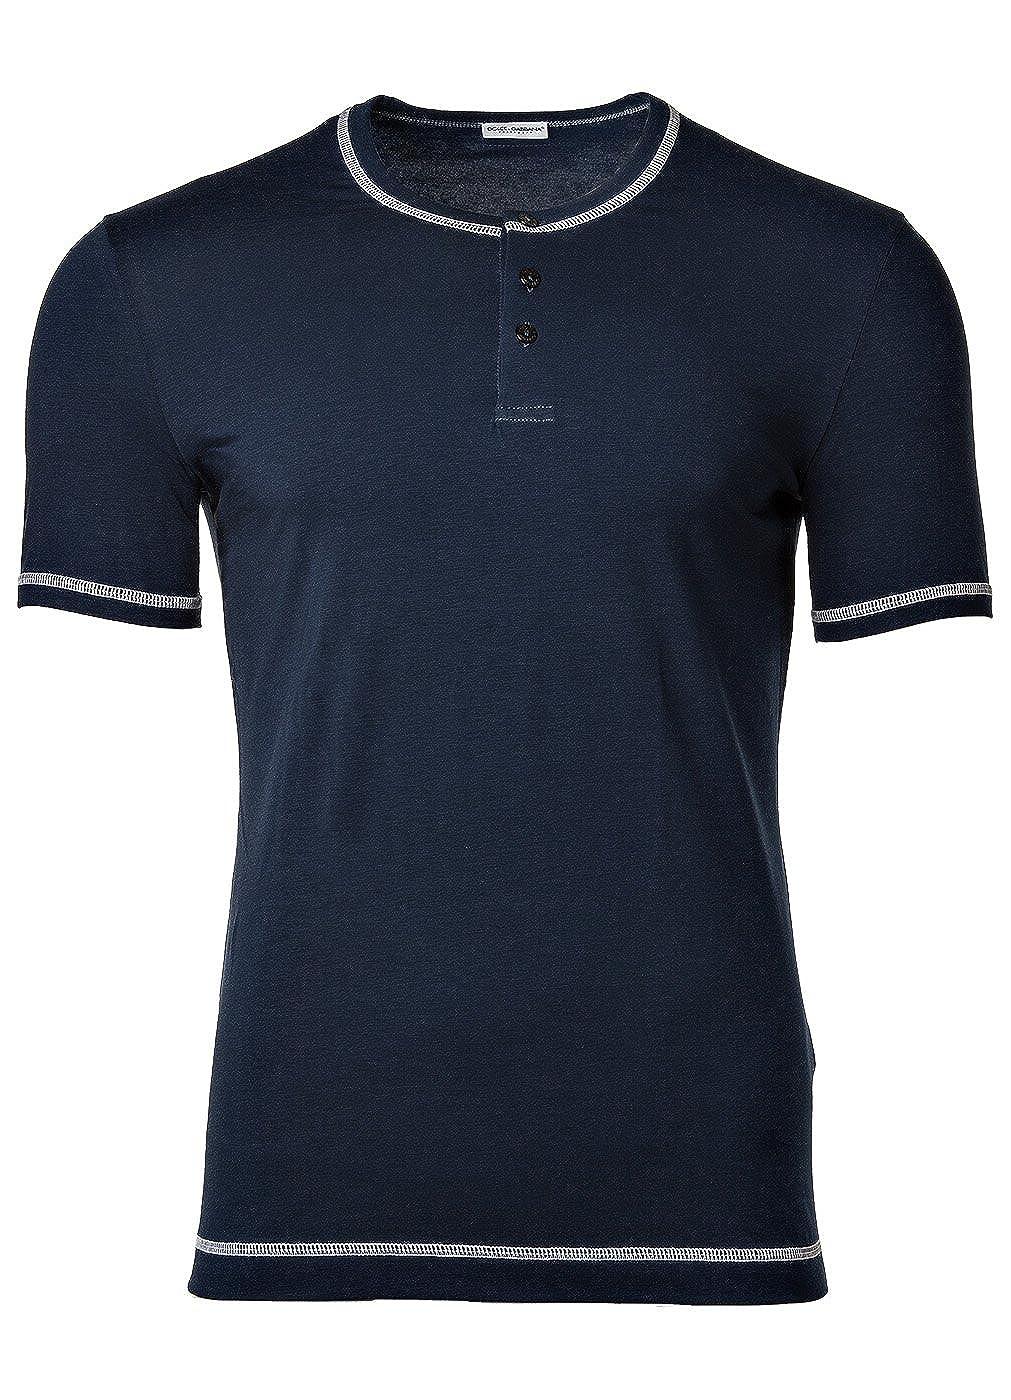 Dolce & Gabbana La Camiseta Ropa Interior Hombre Serafino, D & G S-XL - Azul Marino o Blanco: Colour: Dark Blue   Size: X-Large: Amazon.es: Ropa y ...